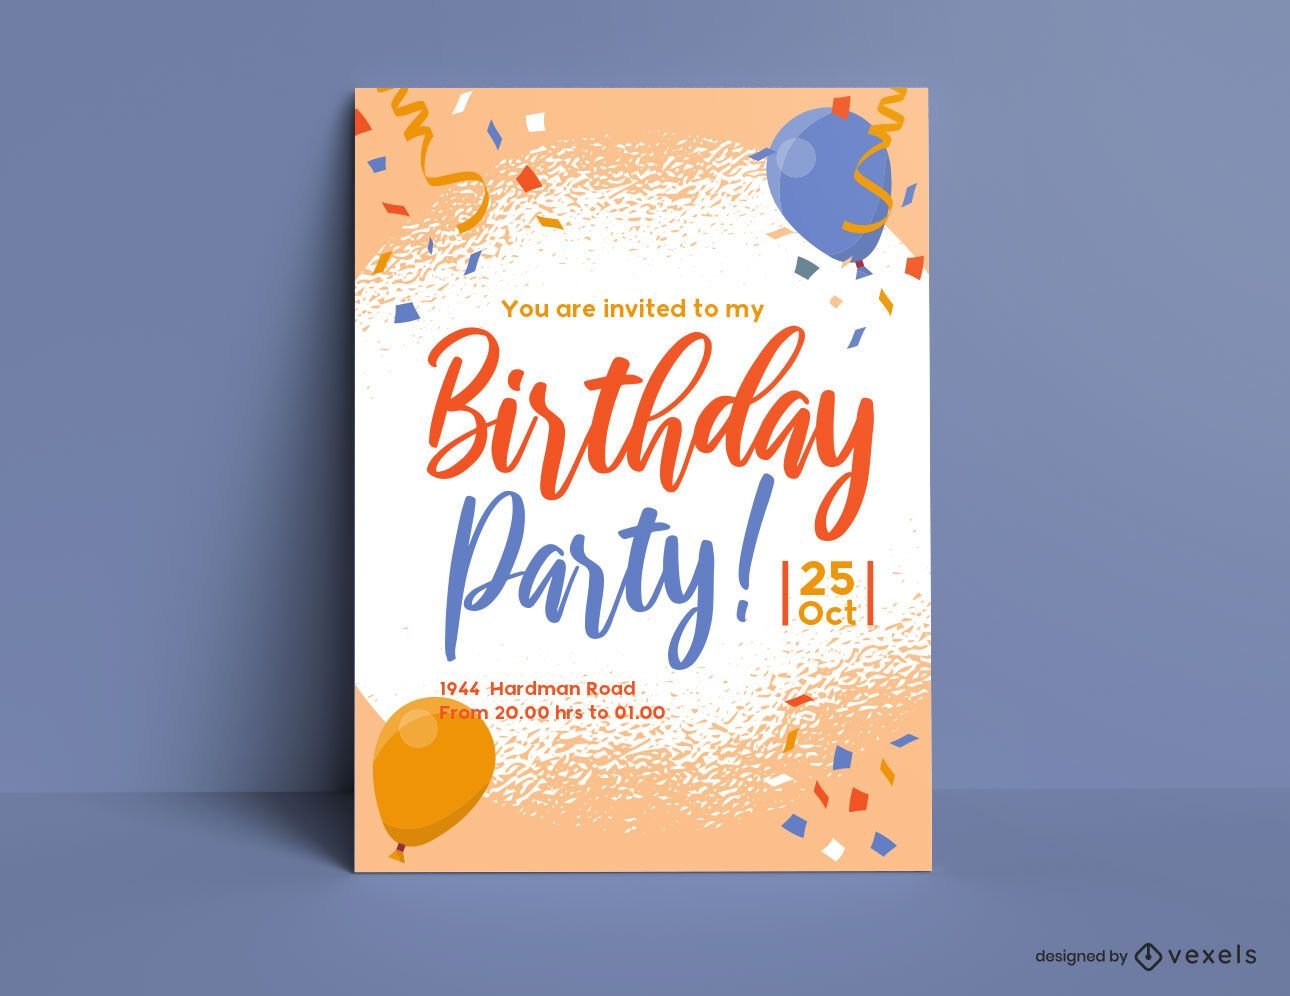 Birthday Party Portrait Invitation Template